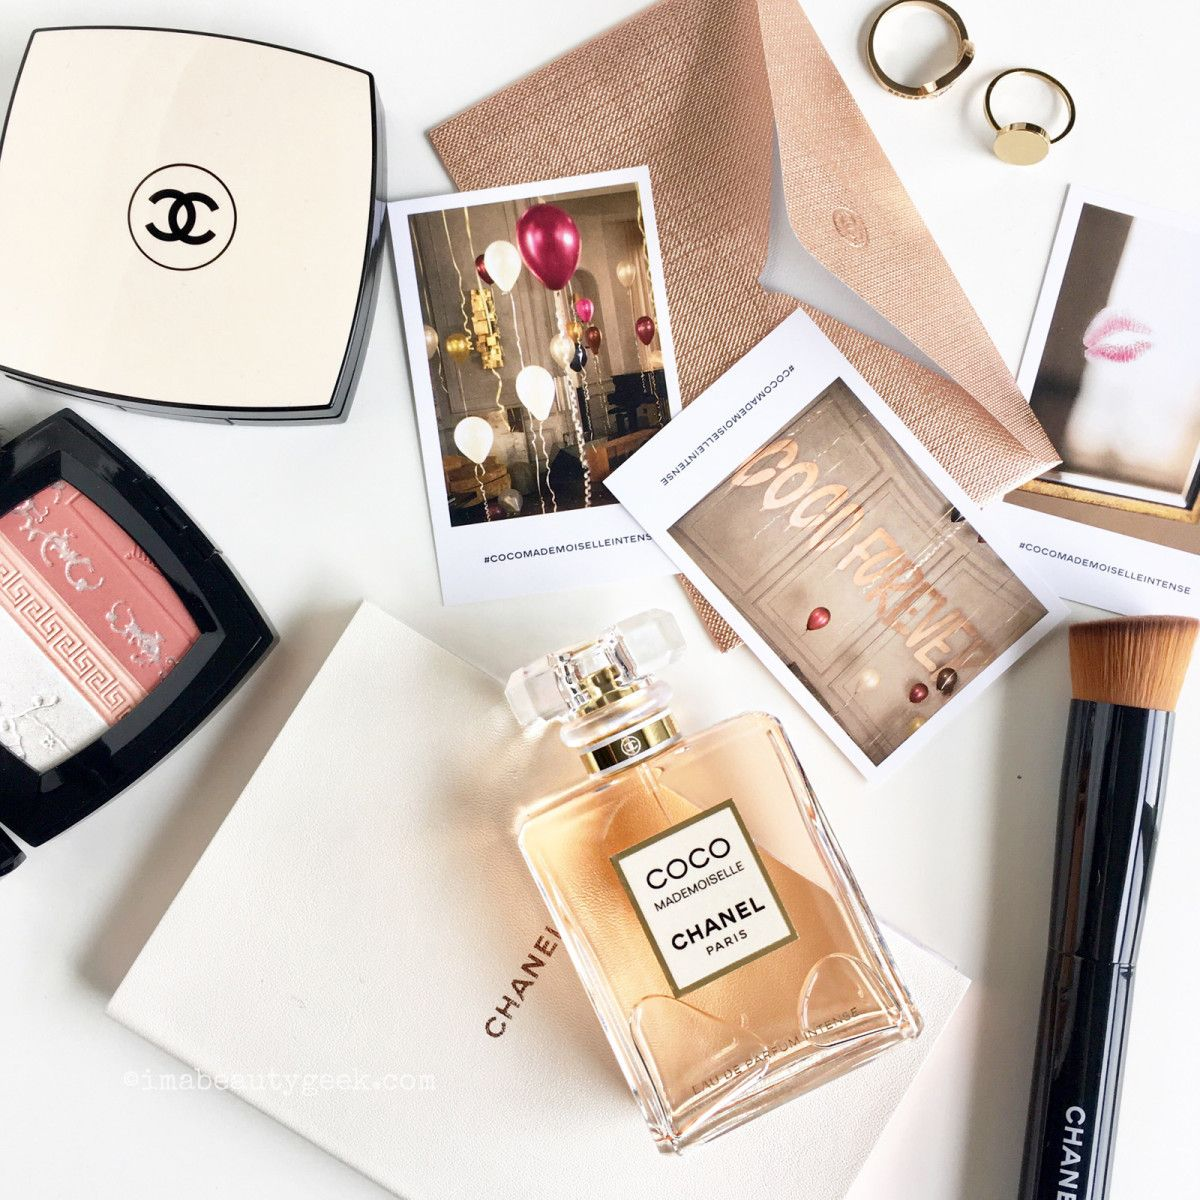 170f0a5852 Chanel Coco Mademoiselle Eau de Parfum Intense, 50 mL, $129 CAD/$110 USD